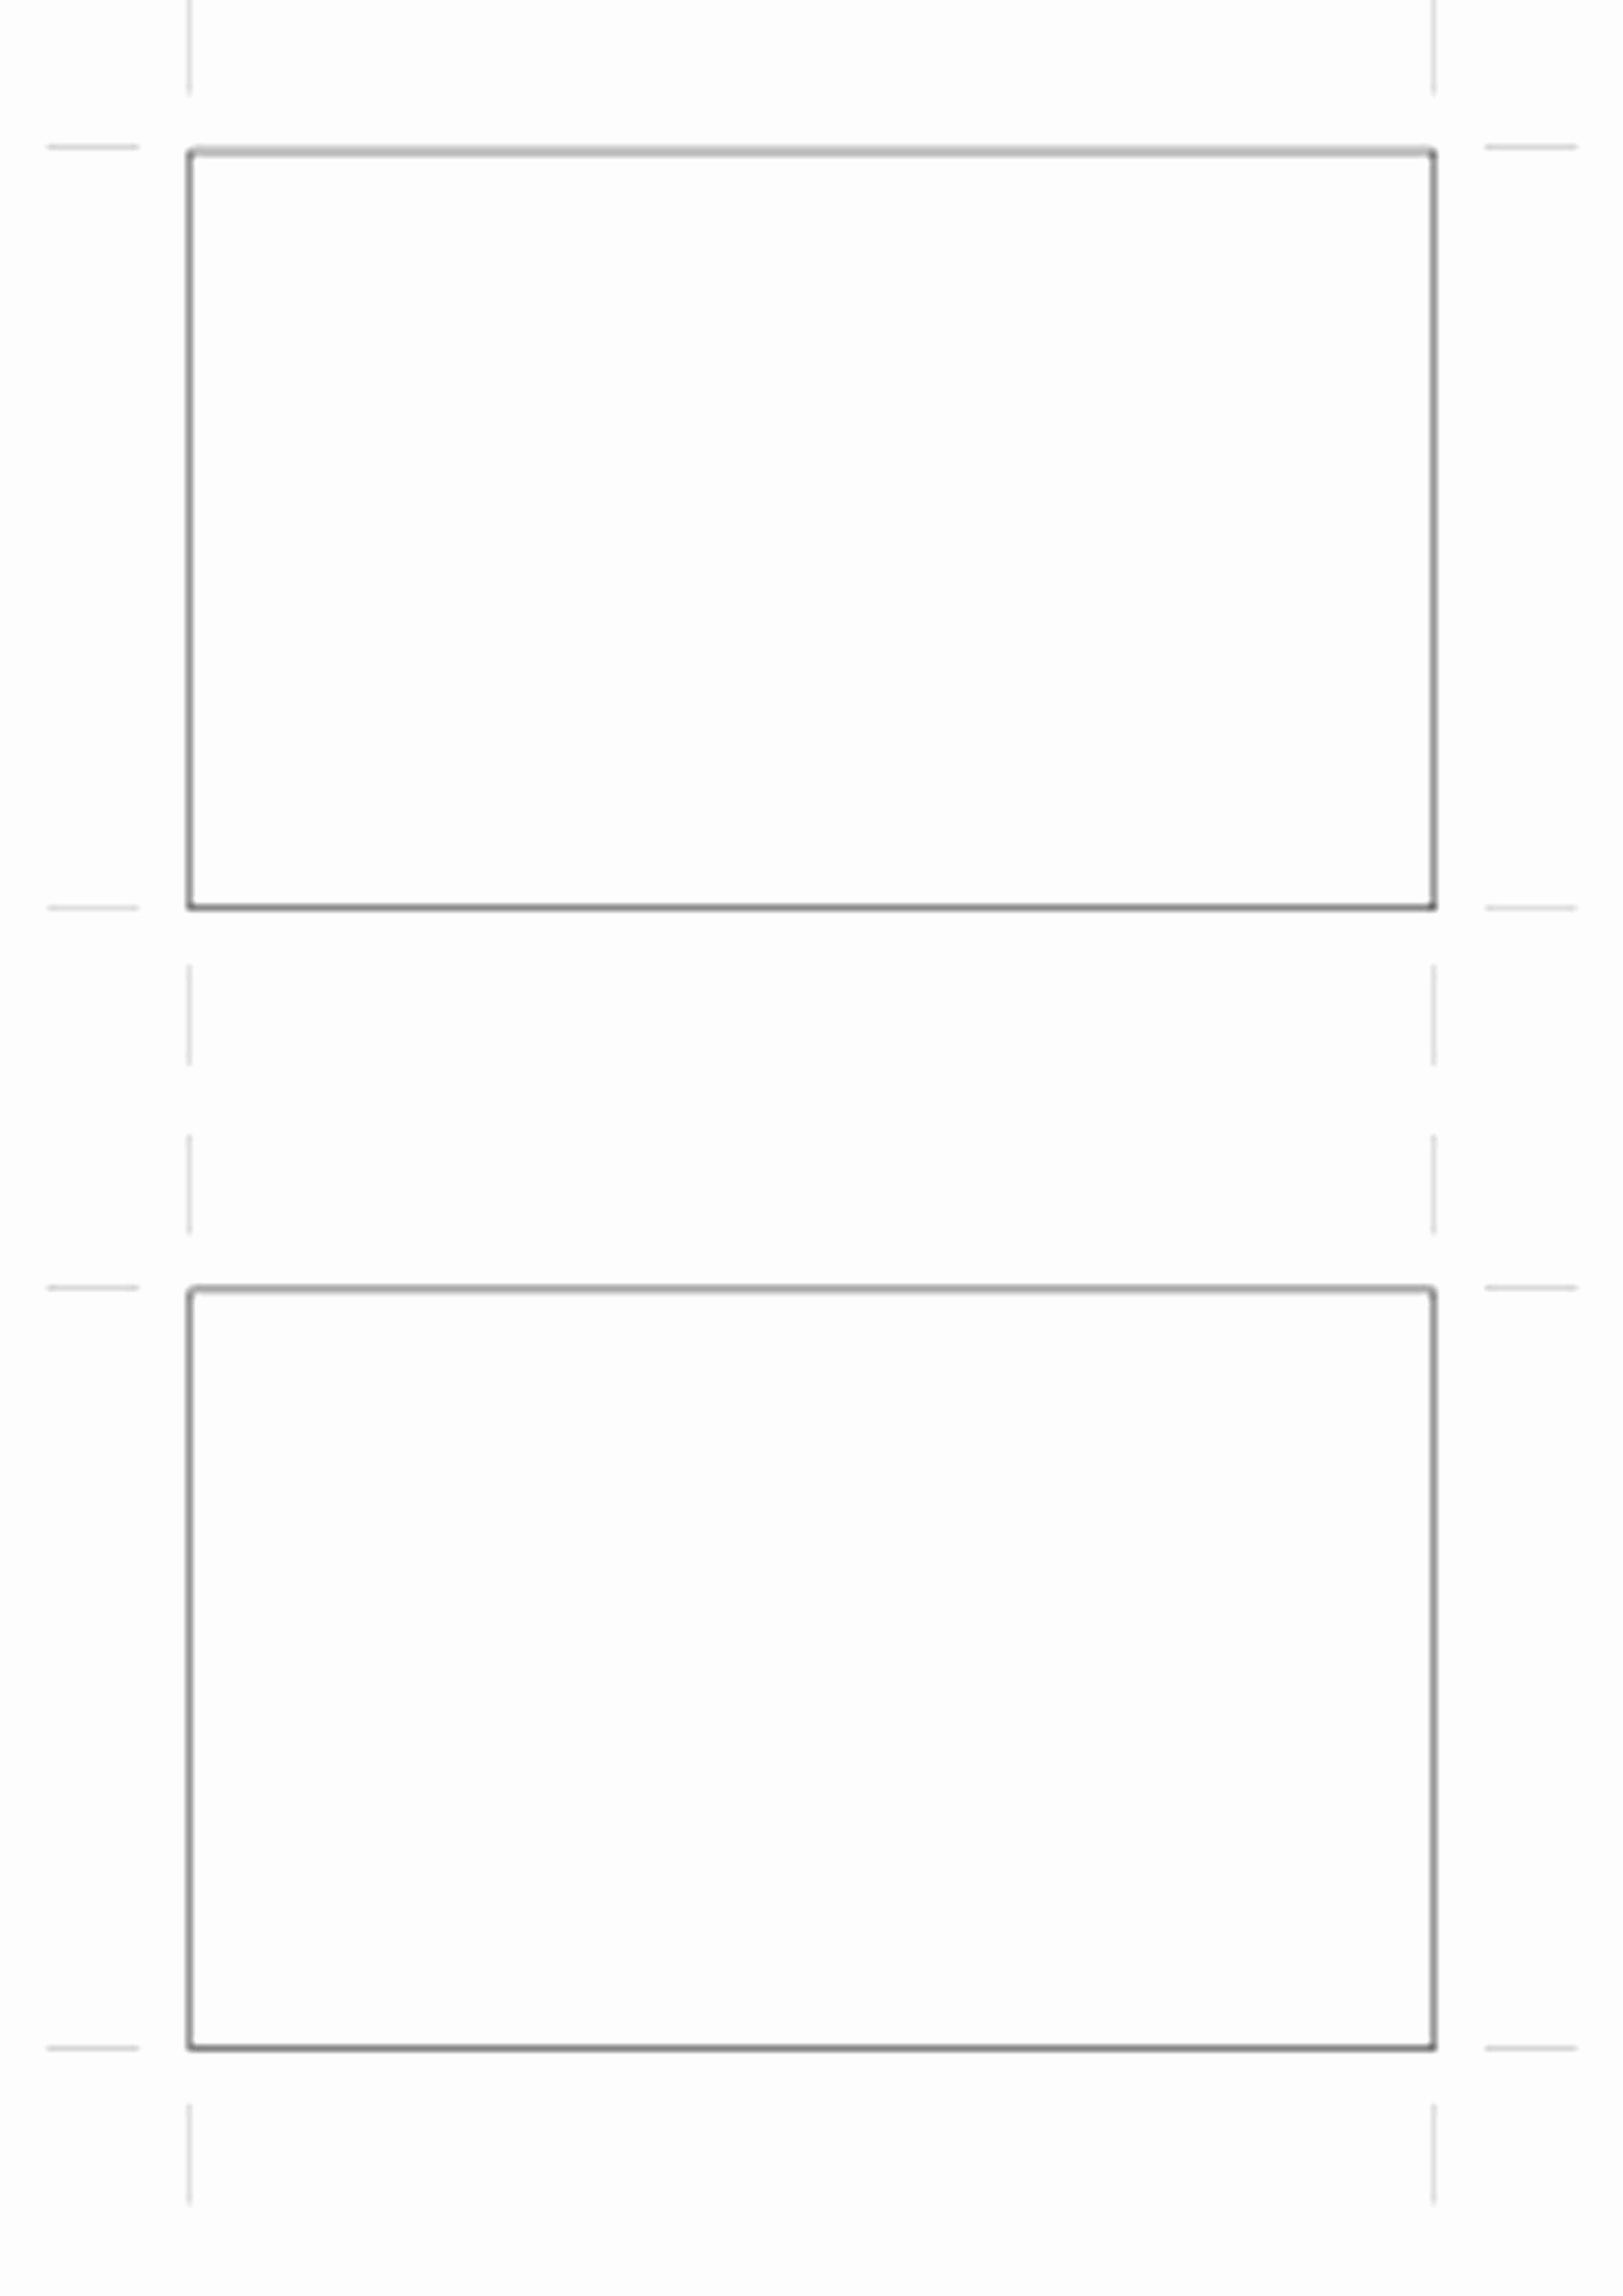 Microsoft Business Card Templates Free Elegant Business Cards Templates Free Download Word Elegant